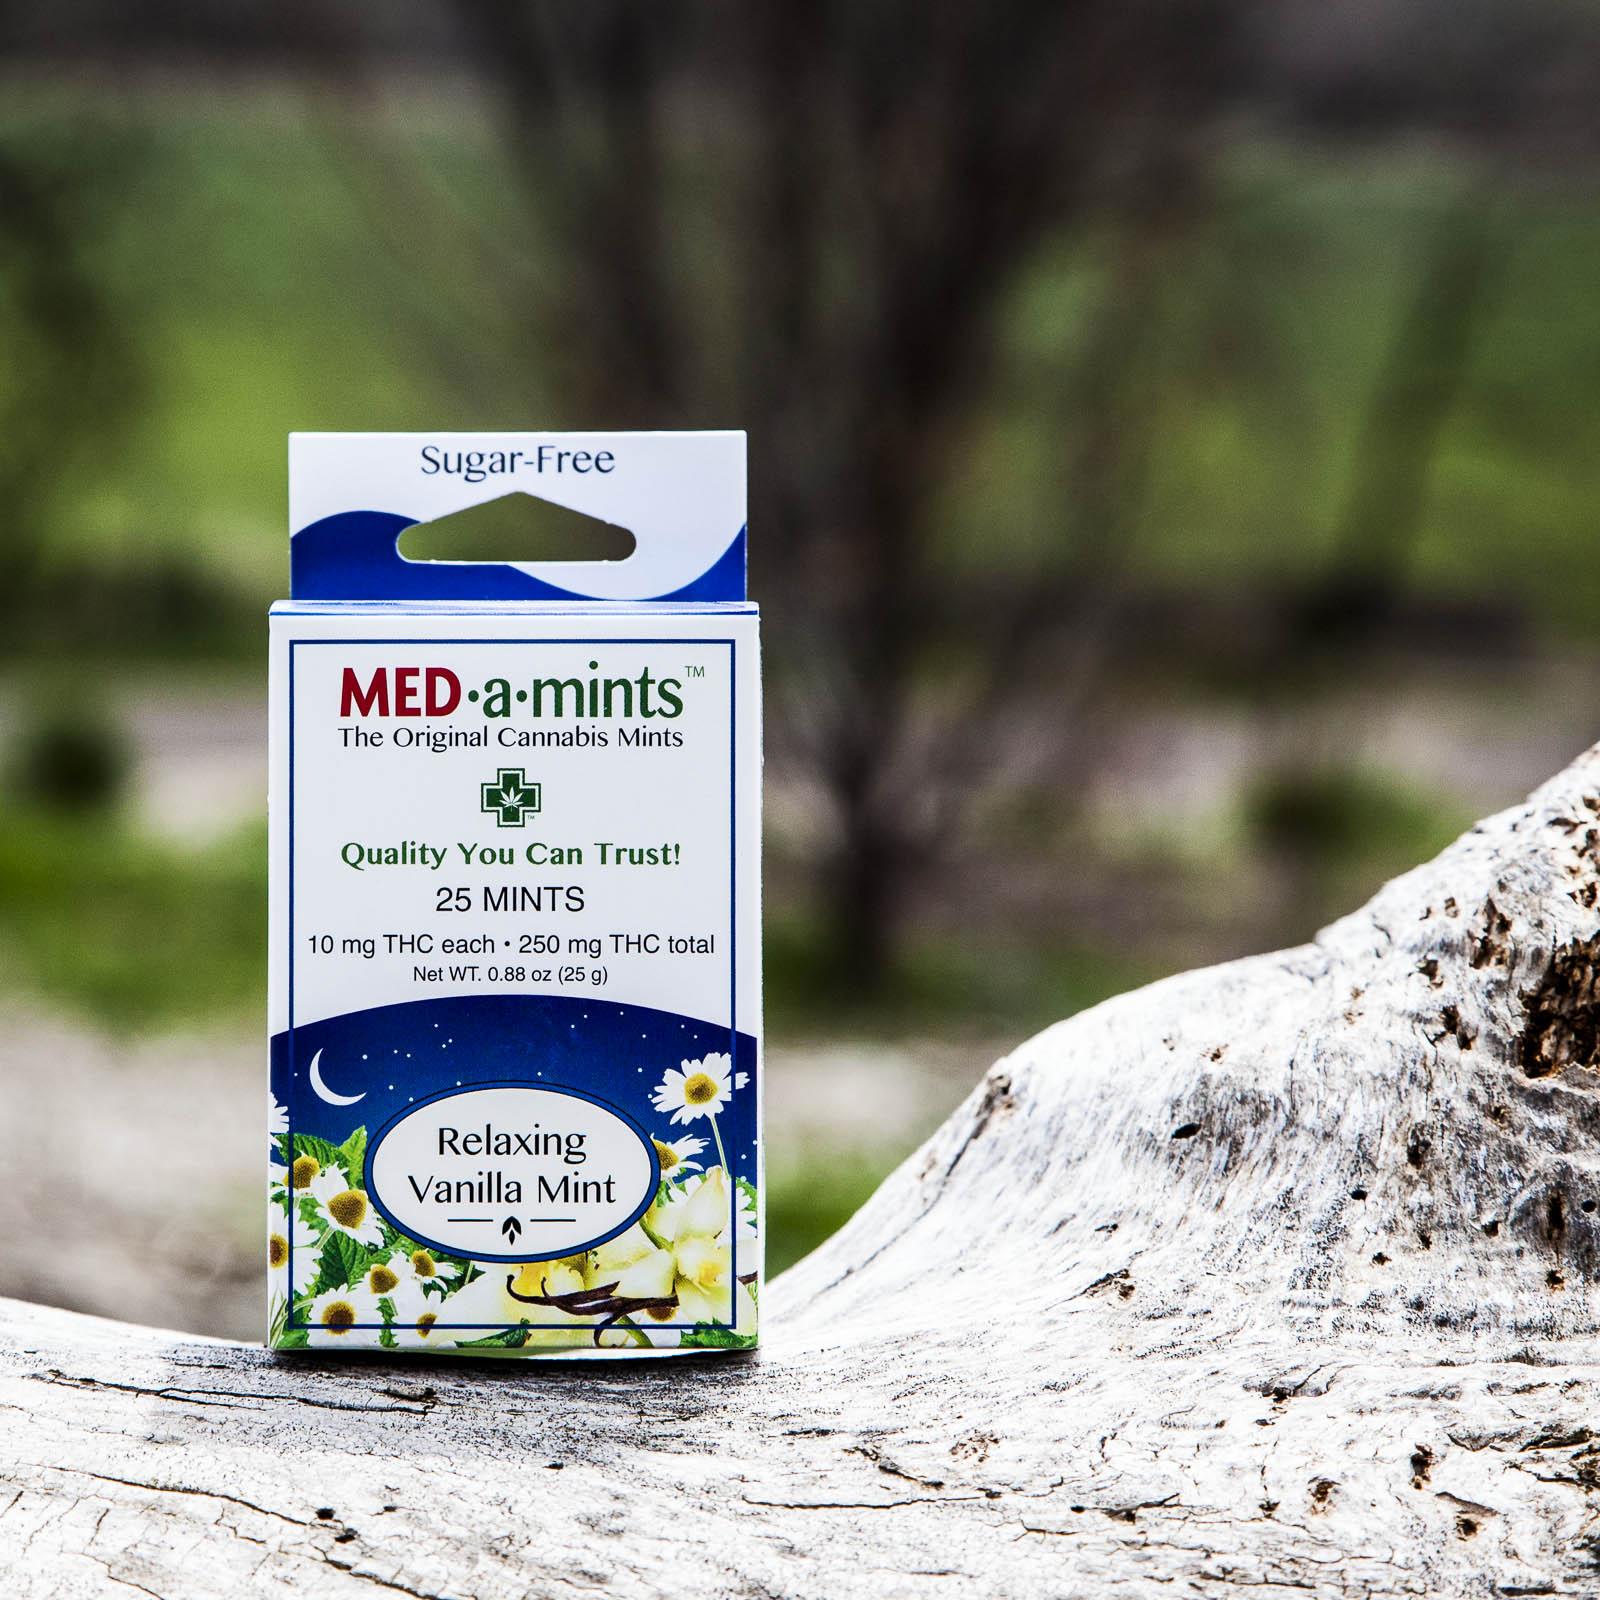 medamints-potent-thc-cannabis-marijuana-mints-025